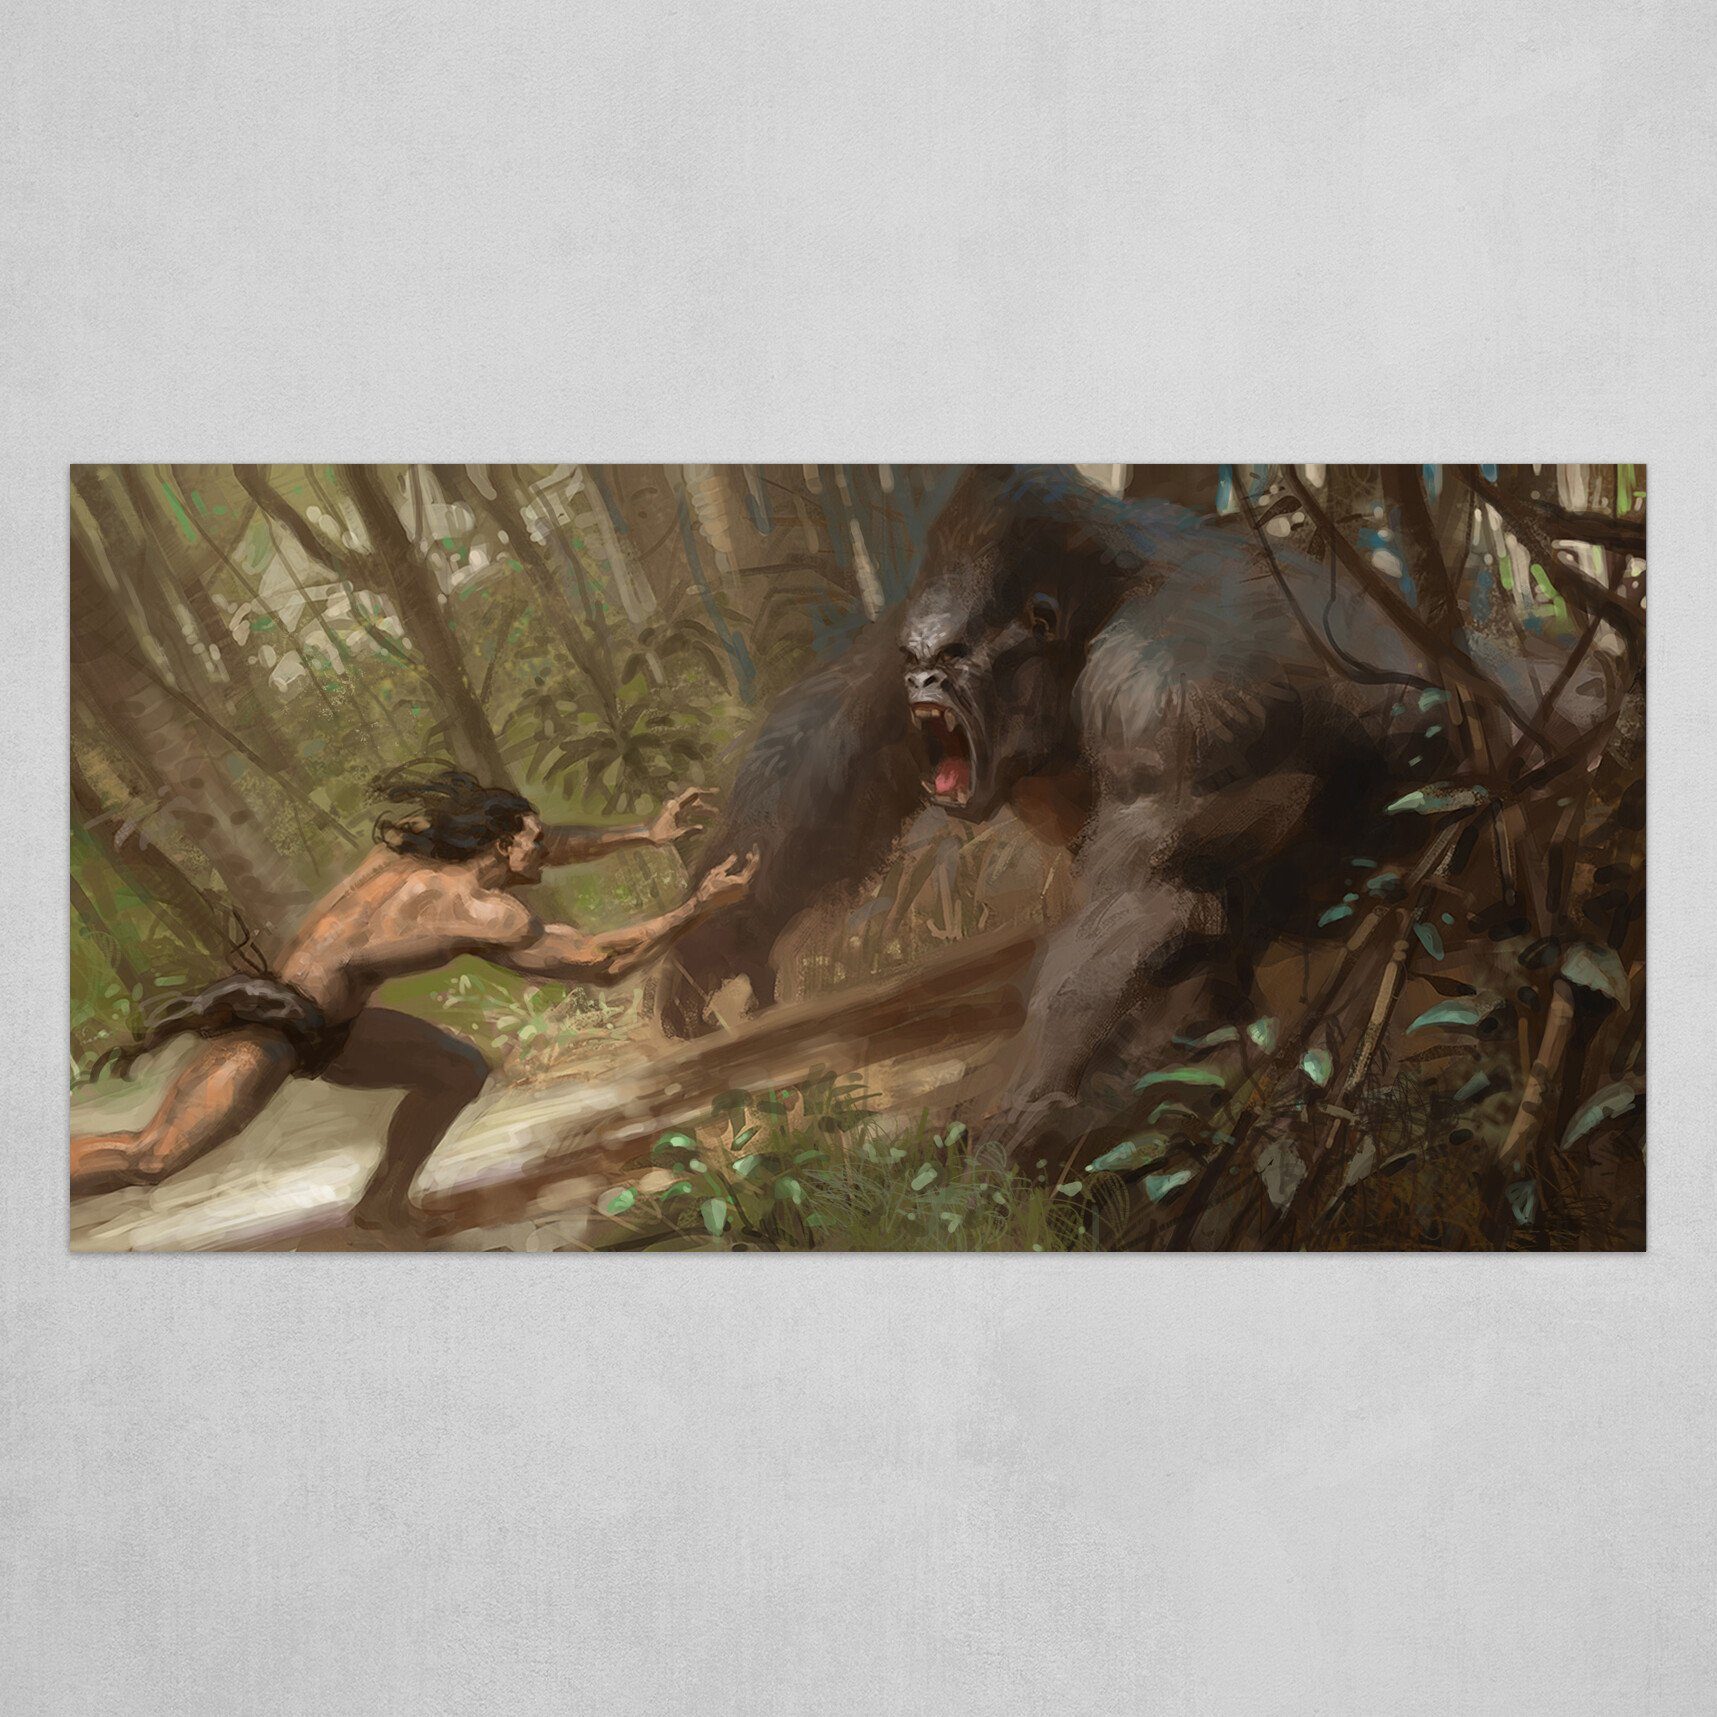 Tarzan fights Kerchak